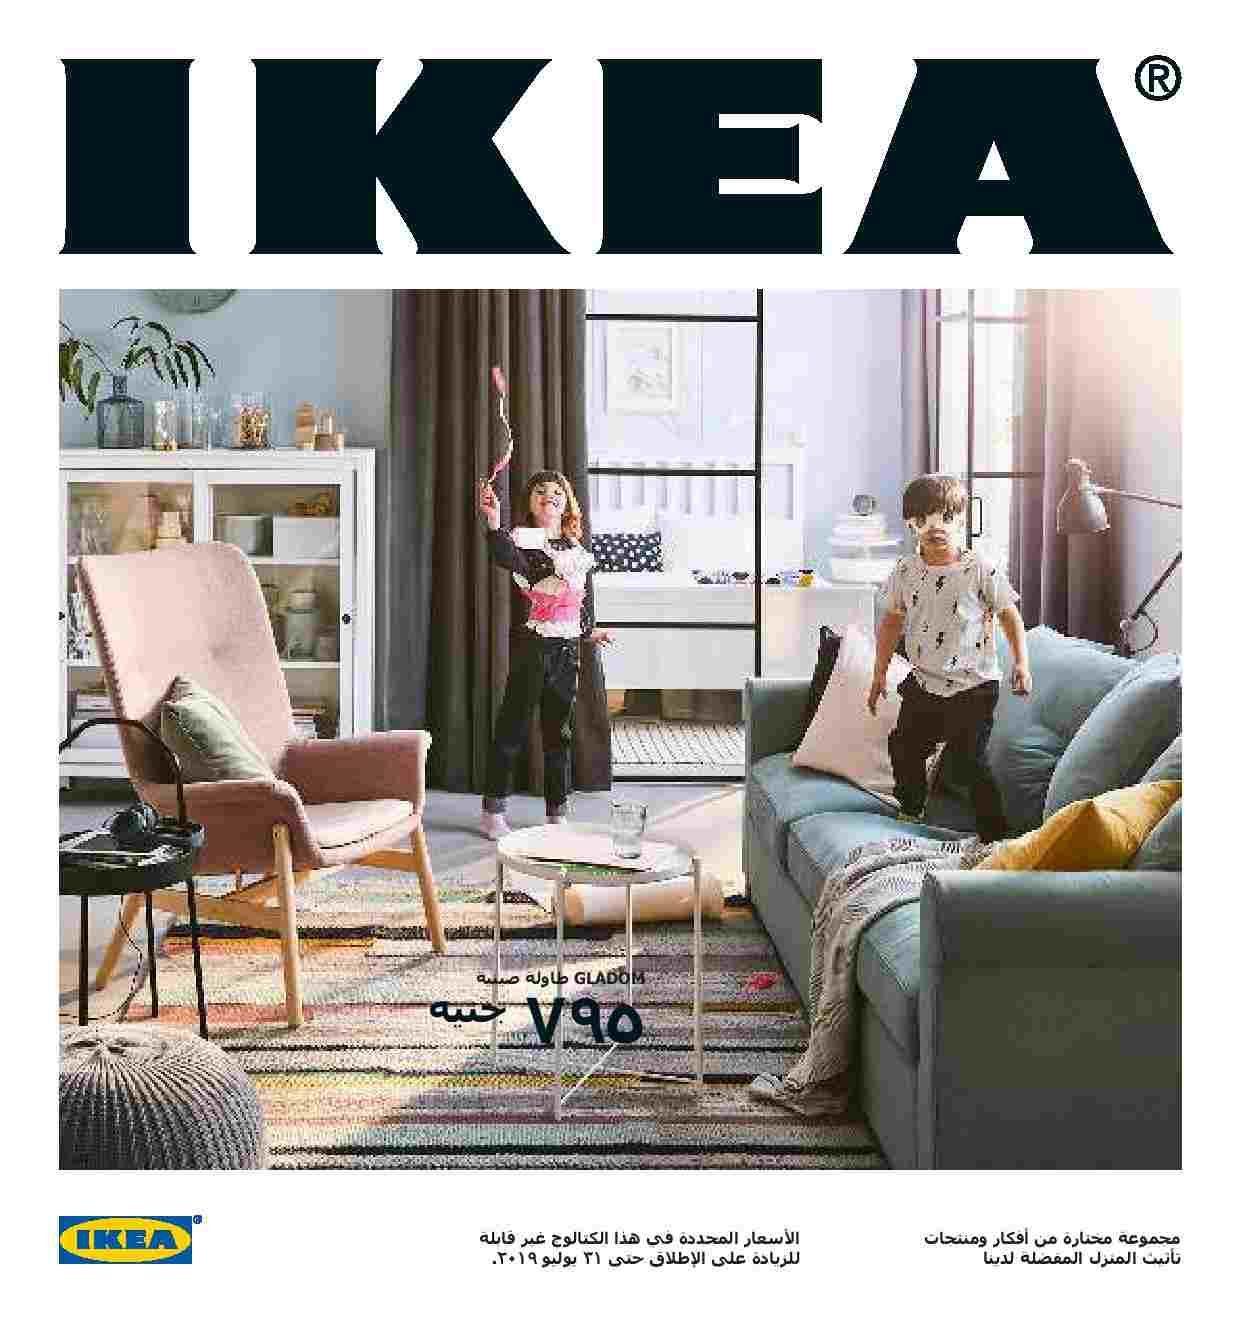 كتالوج ايكيا مصر 2019 الجديد Ikea Egypt 3oroodinfo عروض